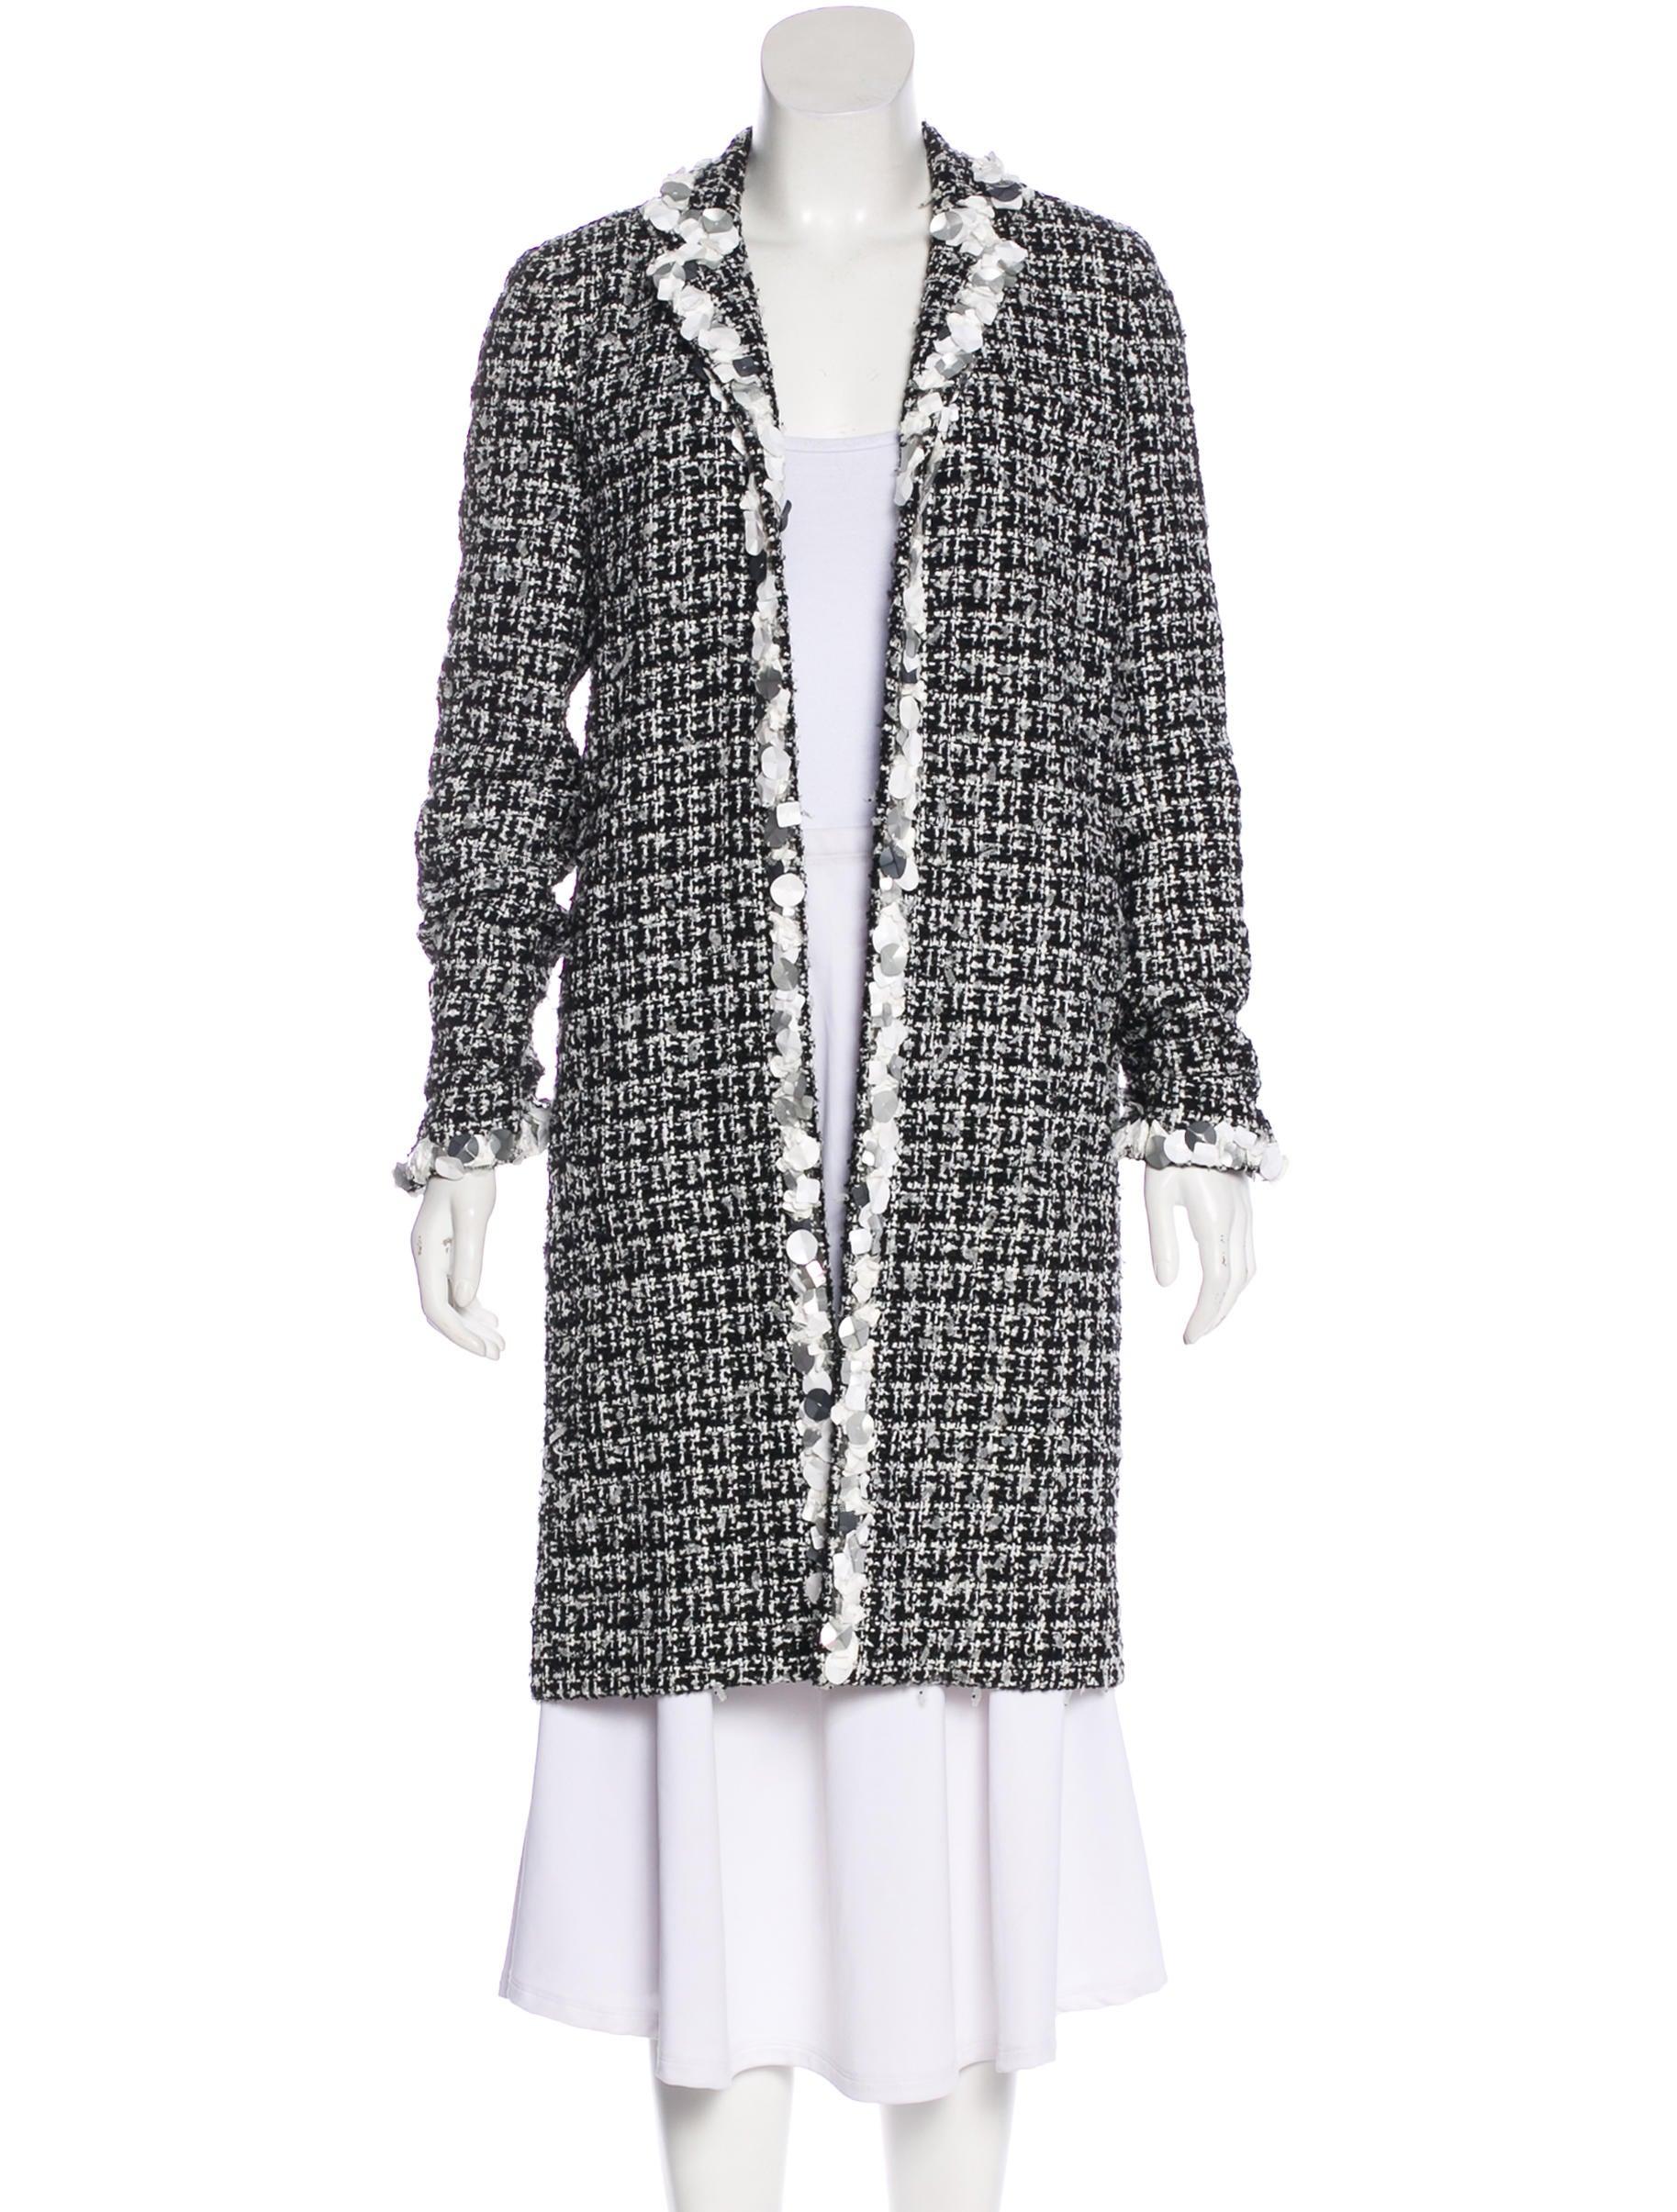 Embellished Tweed Coat by Chanel